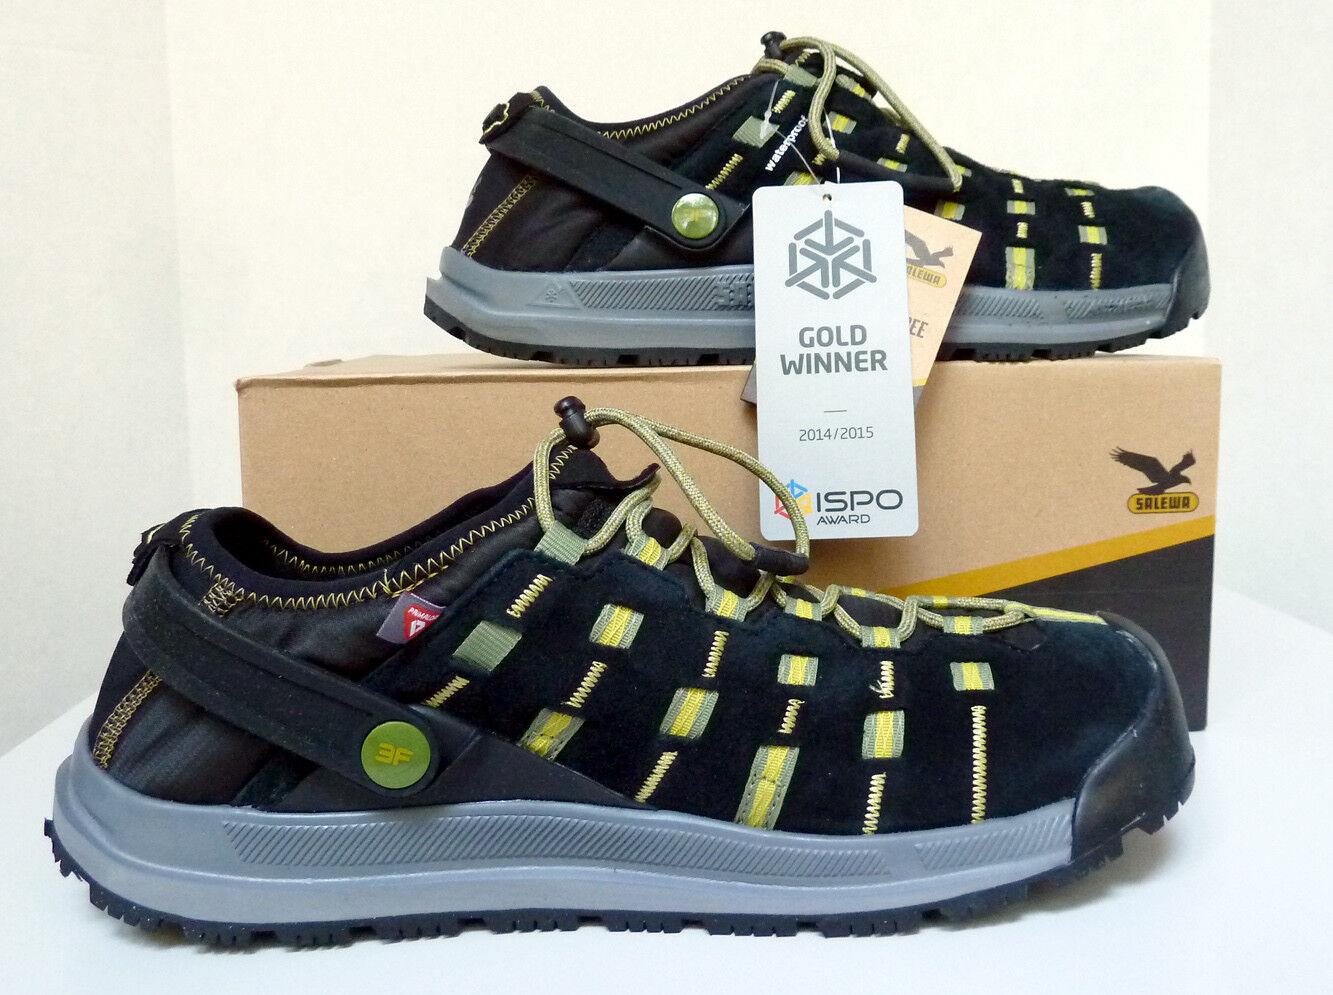 New Men`s Salewa Capsico PrimaLoft shoes Insulated 63406 0901 MSRP MSRP MSRP 120 e9765b